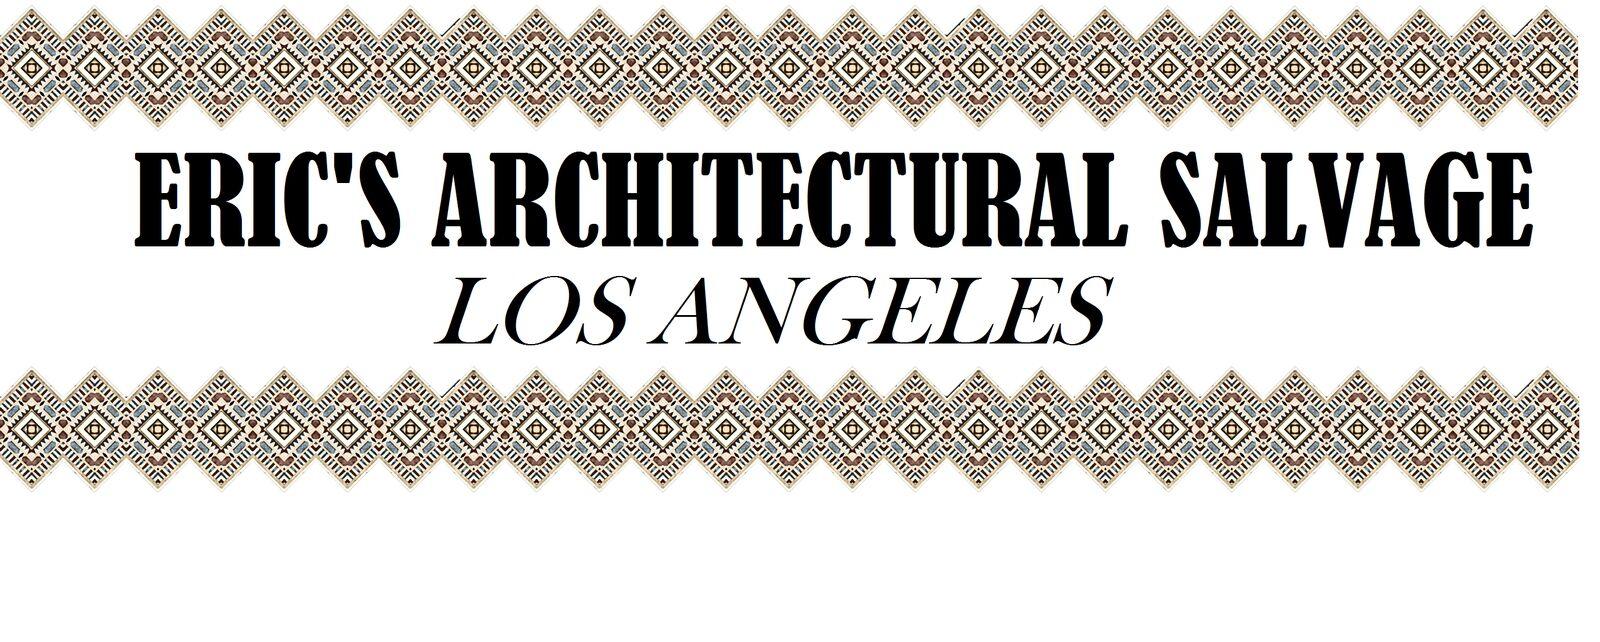 Erics Architectural Salvage LA